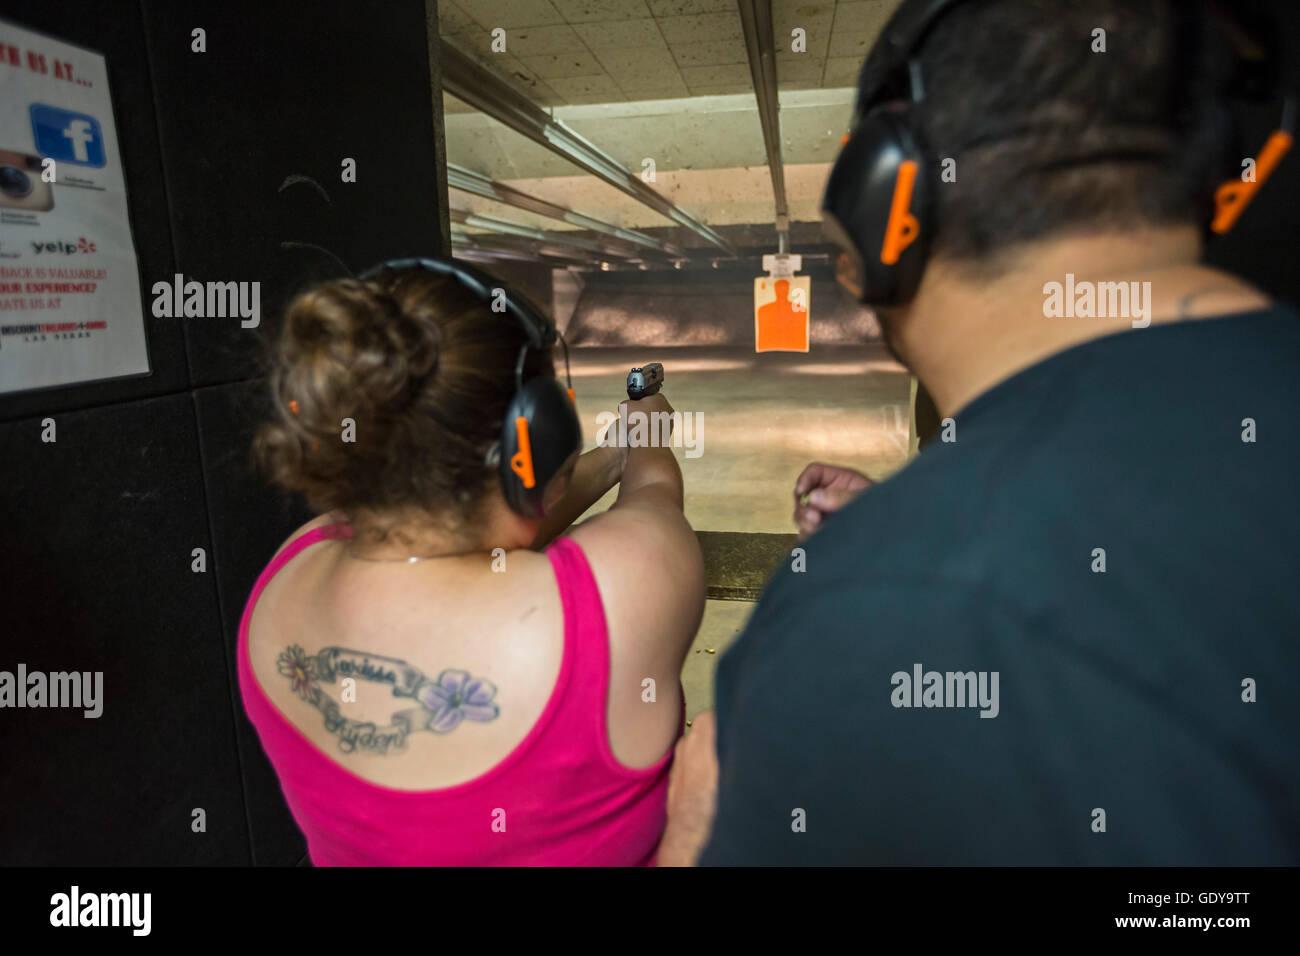 Las Vegas, Nevada - A woman fires her handgun at the Discount Firearms + Ammo indoor shooting range. - Stock Image